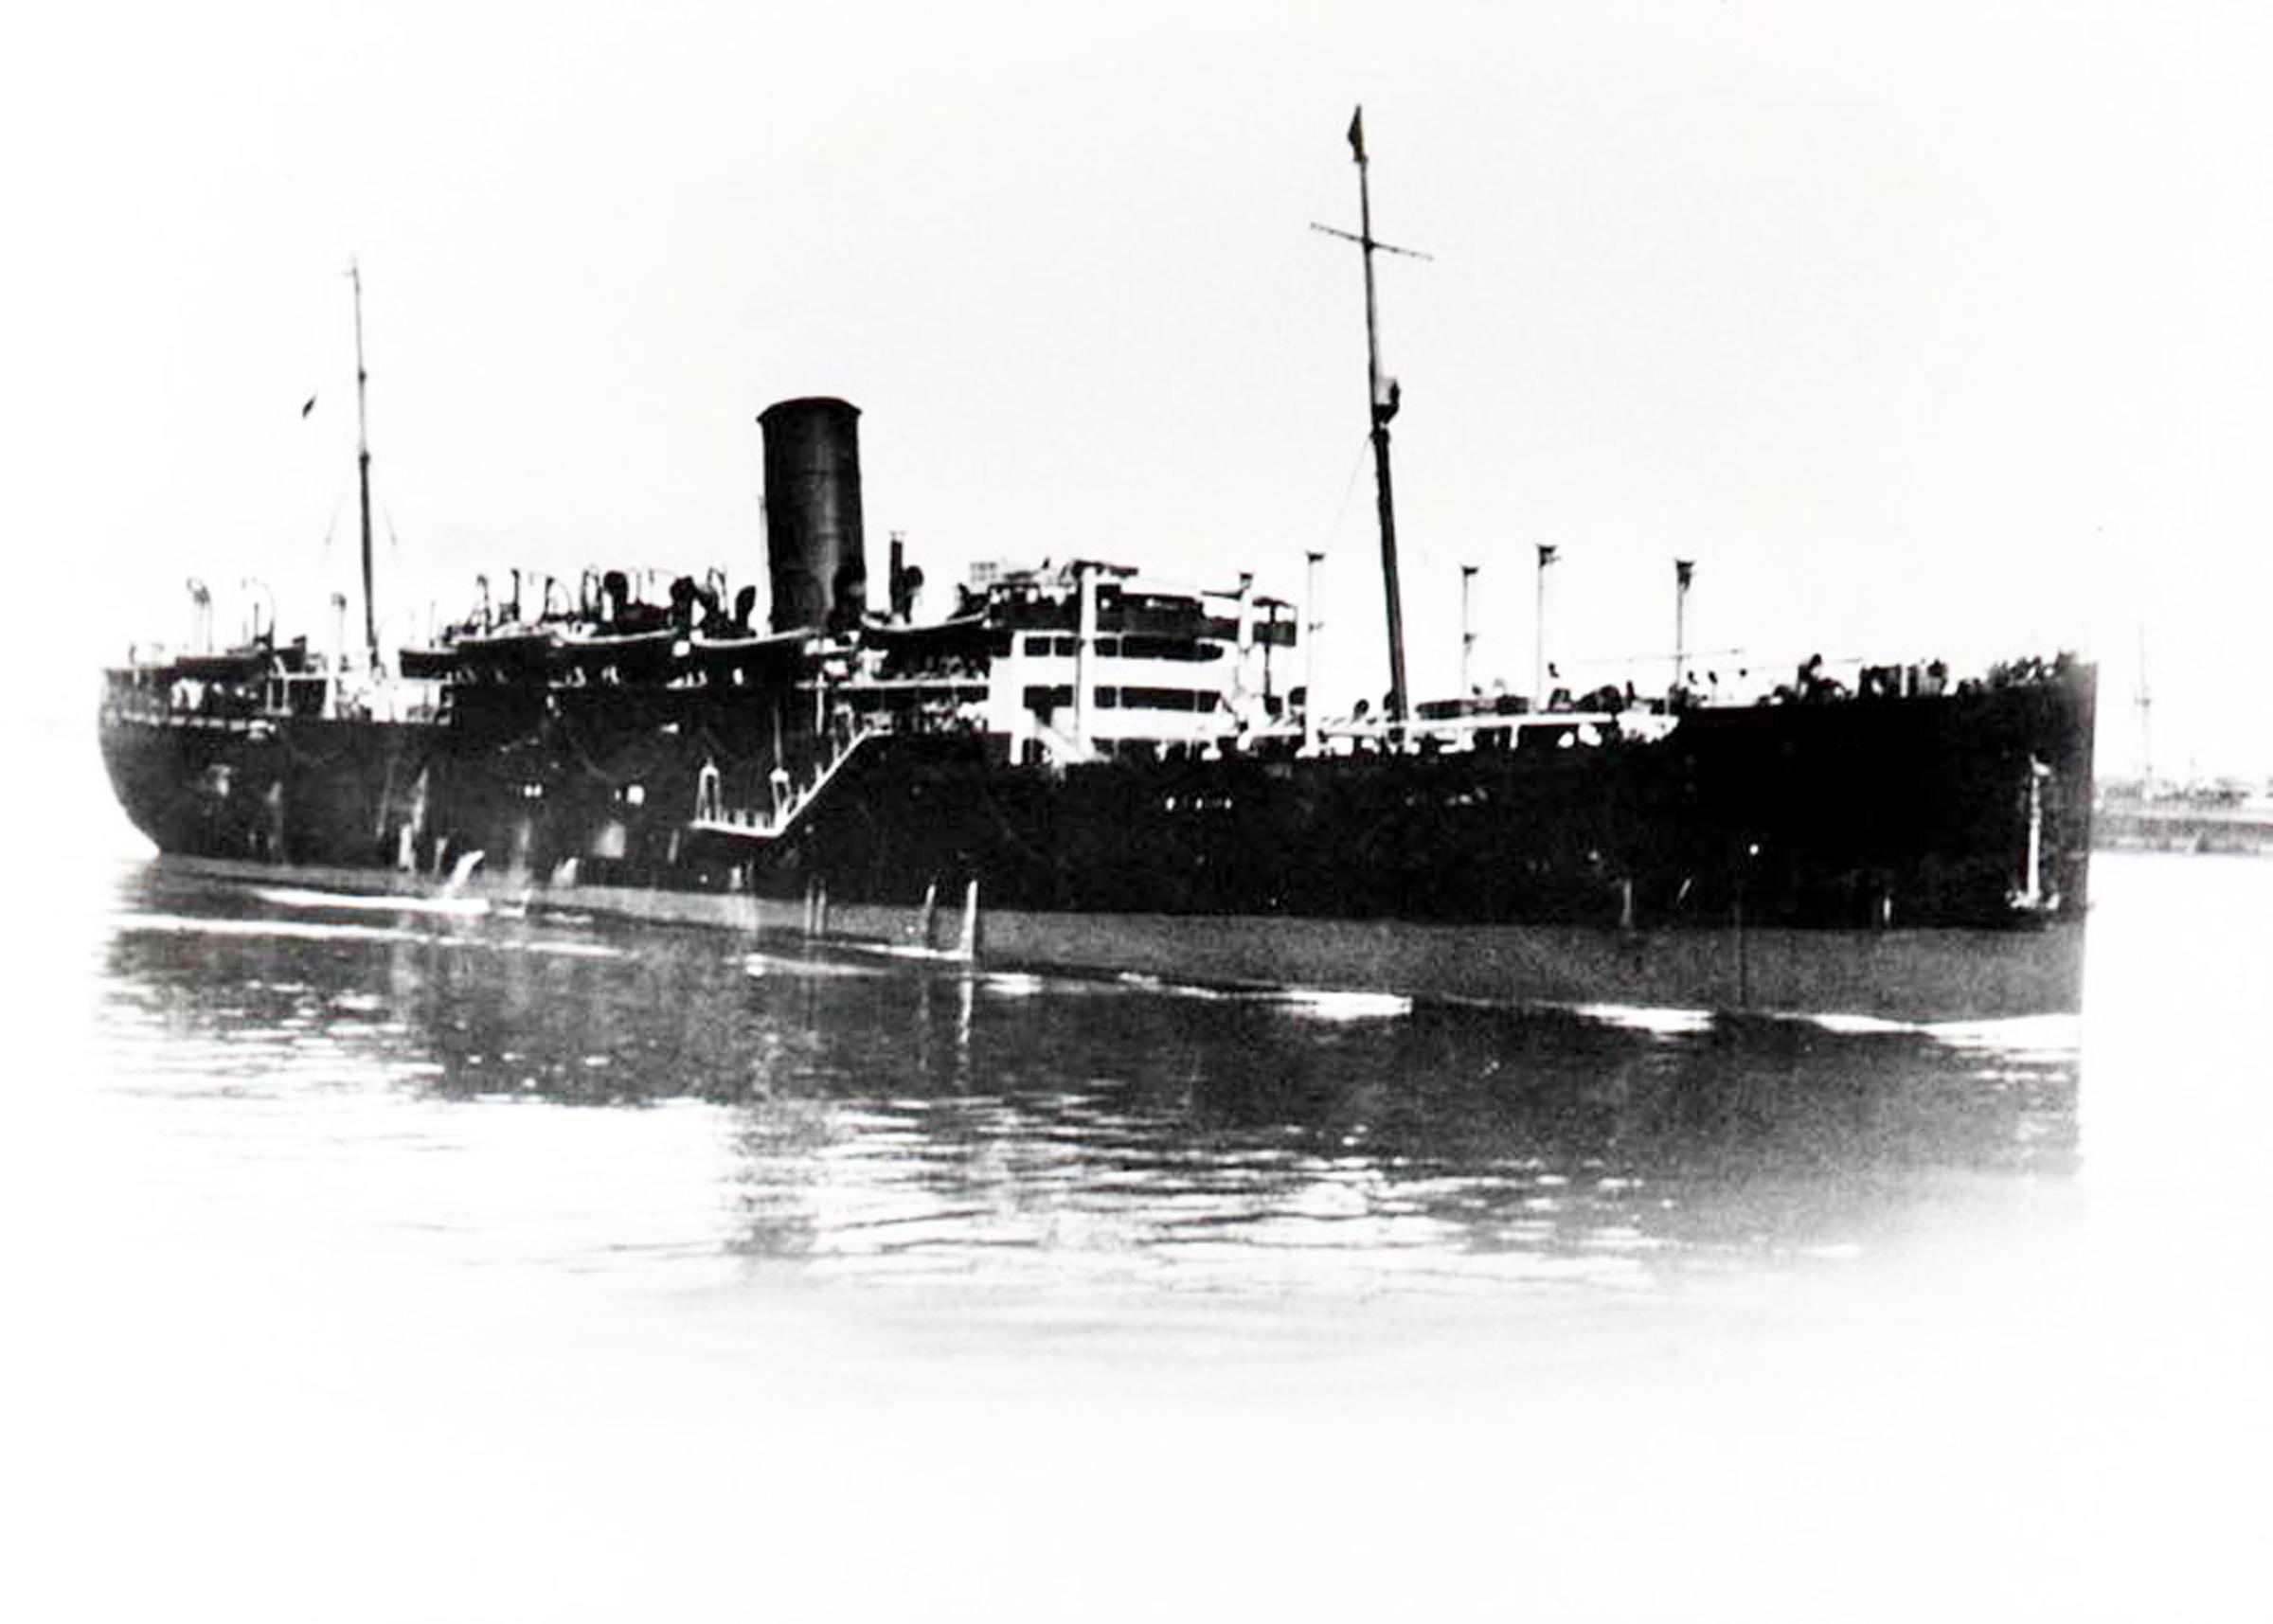 Rohna sinking was start of missile warfare